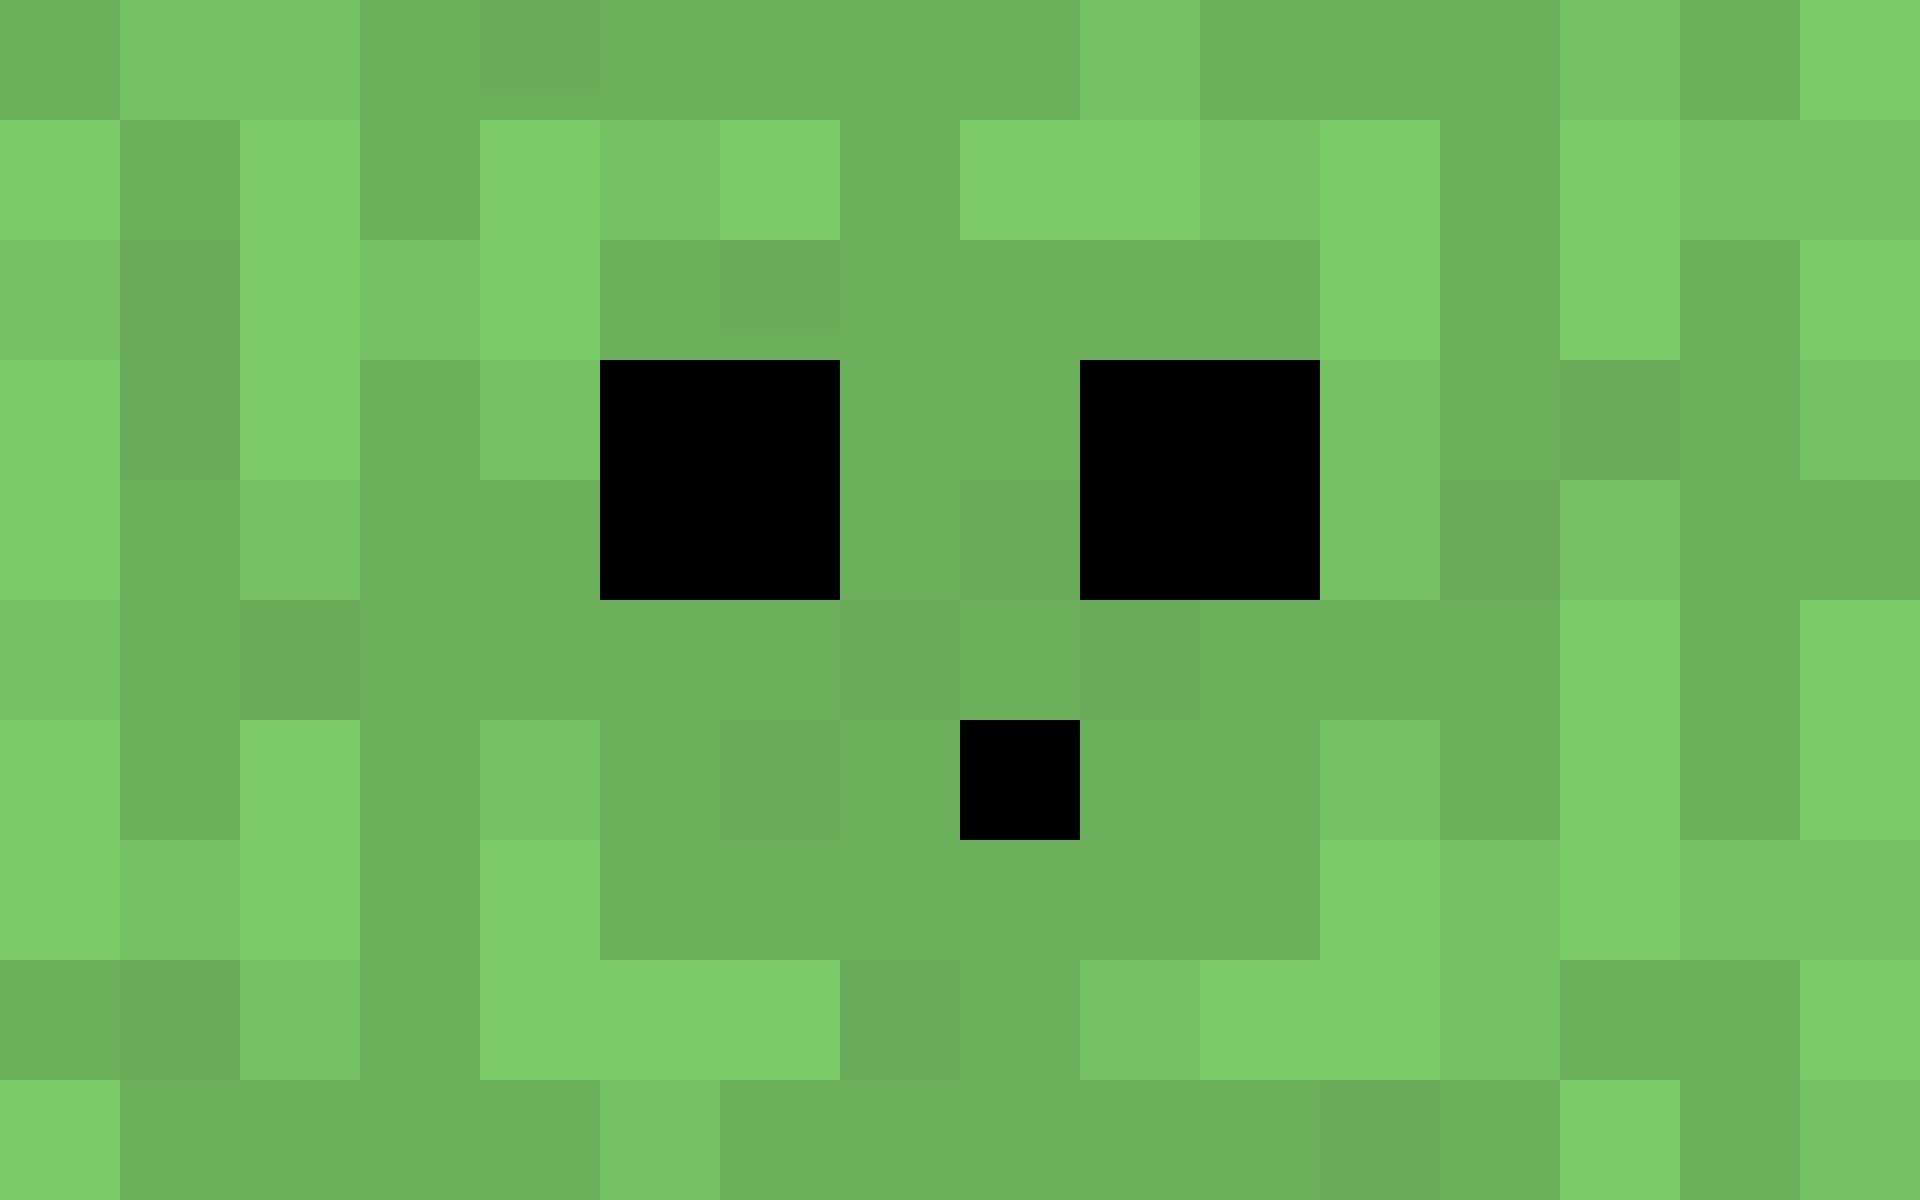 1920x1200 Creeper Wallpaper - Minecraft Wallpaper